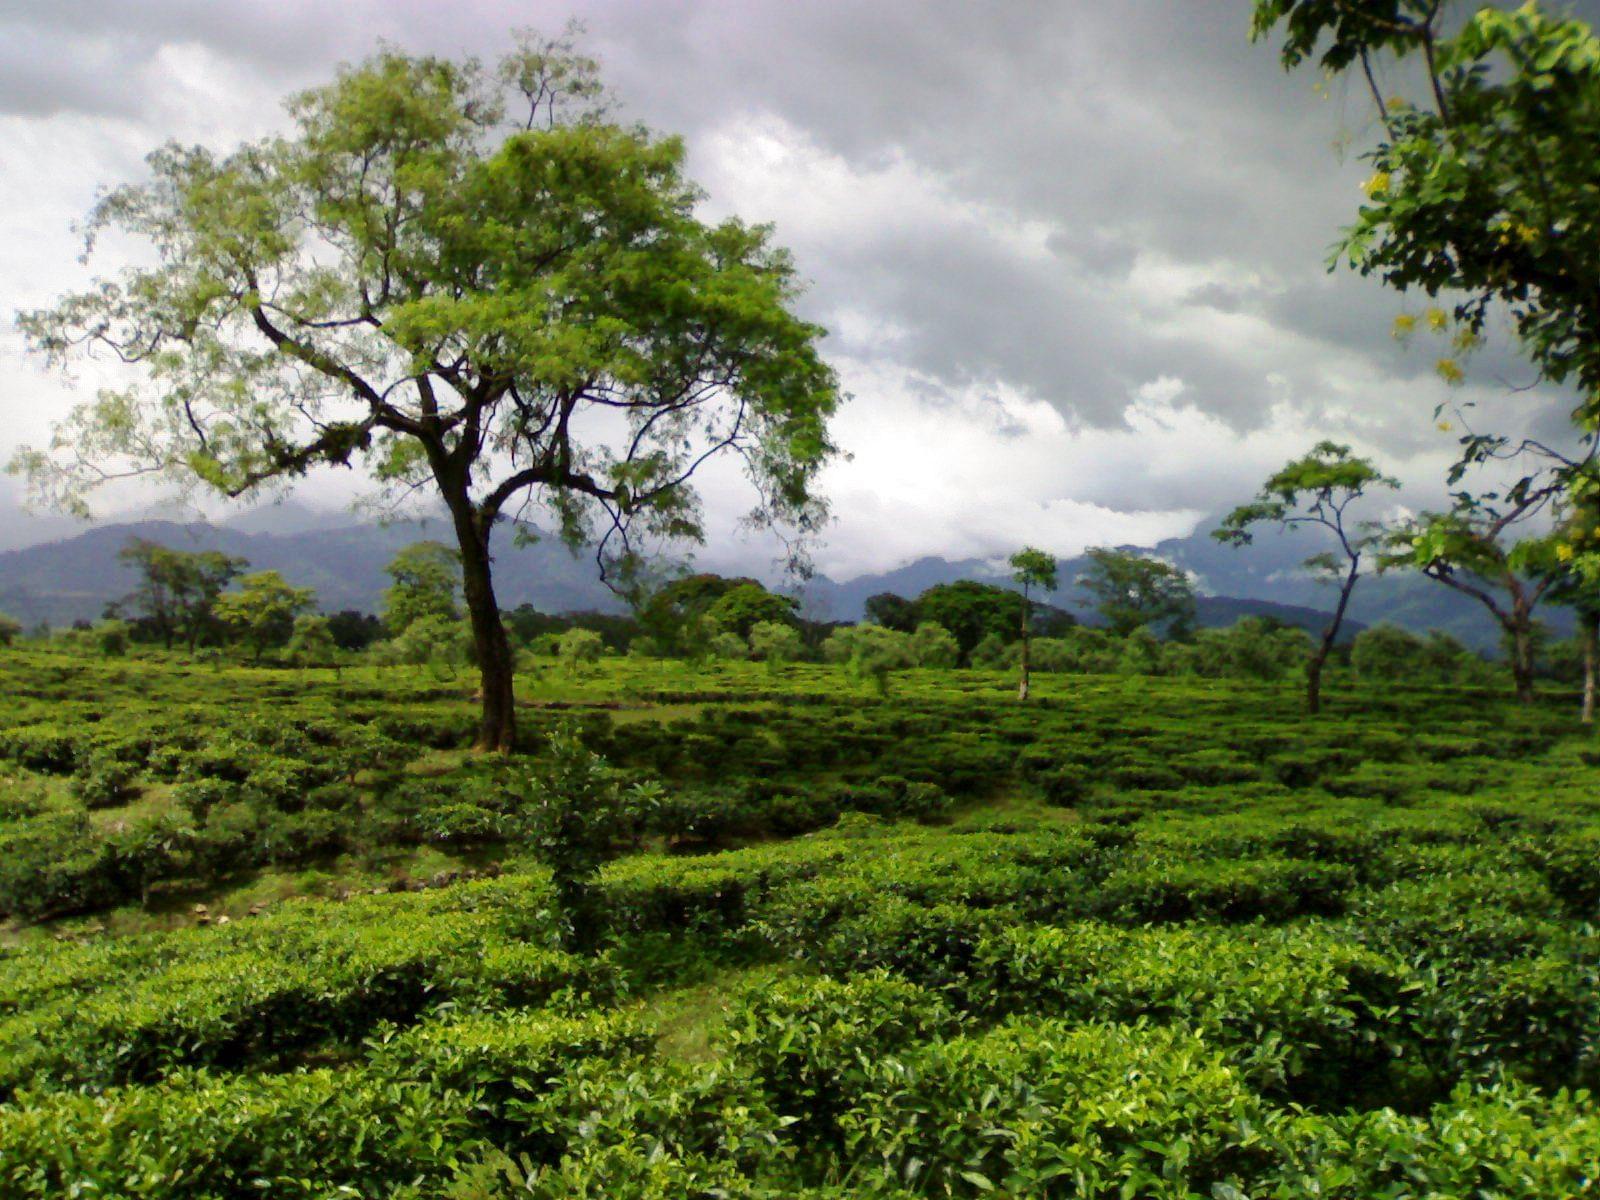 Tea garden in the Dooars. Picture Courtesy: Wikipedia.